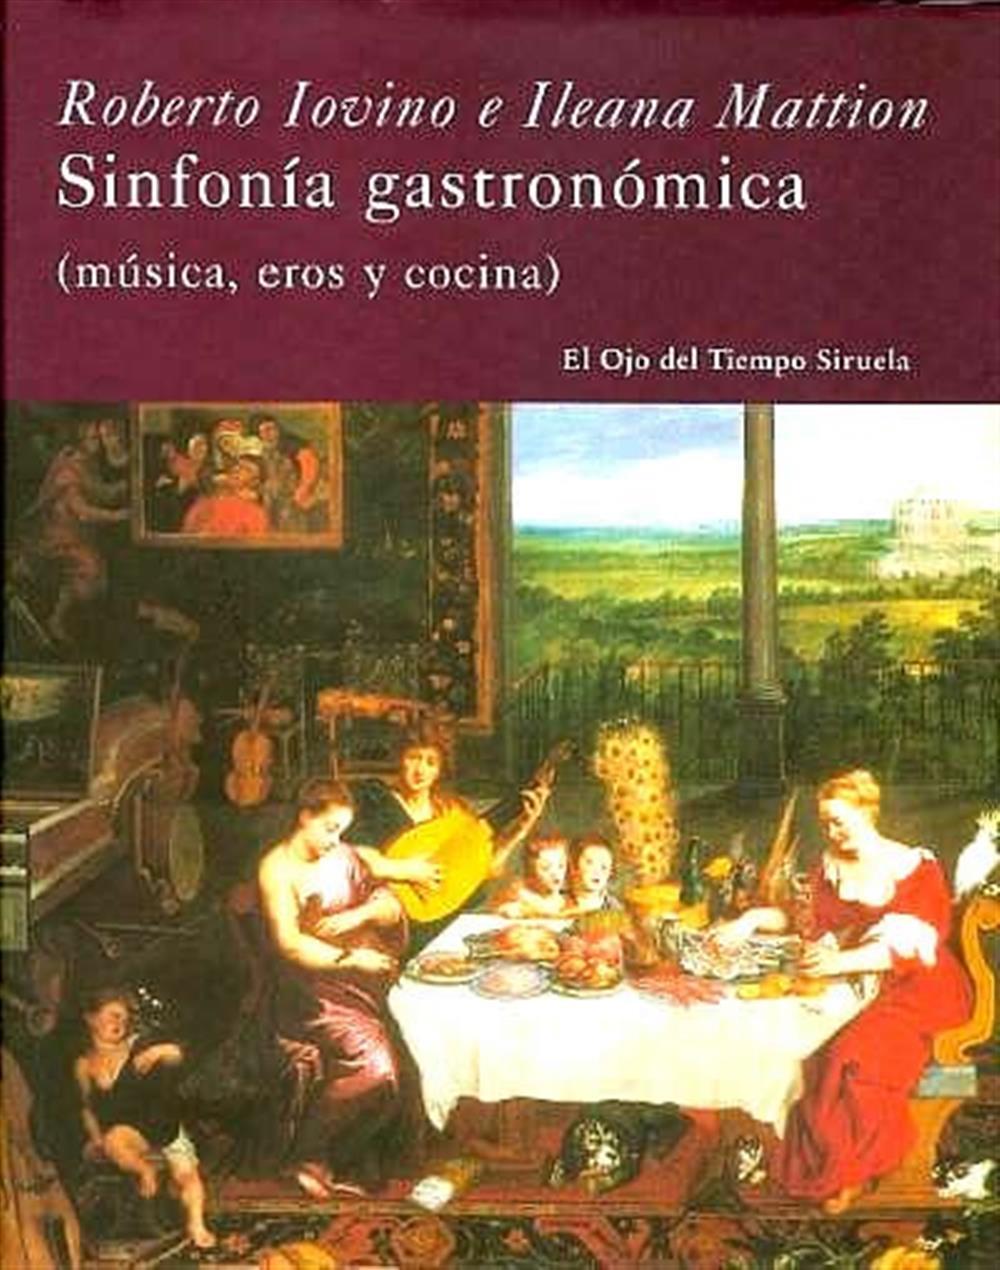 Roberto iovino Sinfonia Gastronomica Siruela Libreria Iniciatica barcelona 9788498412390